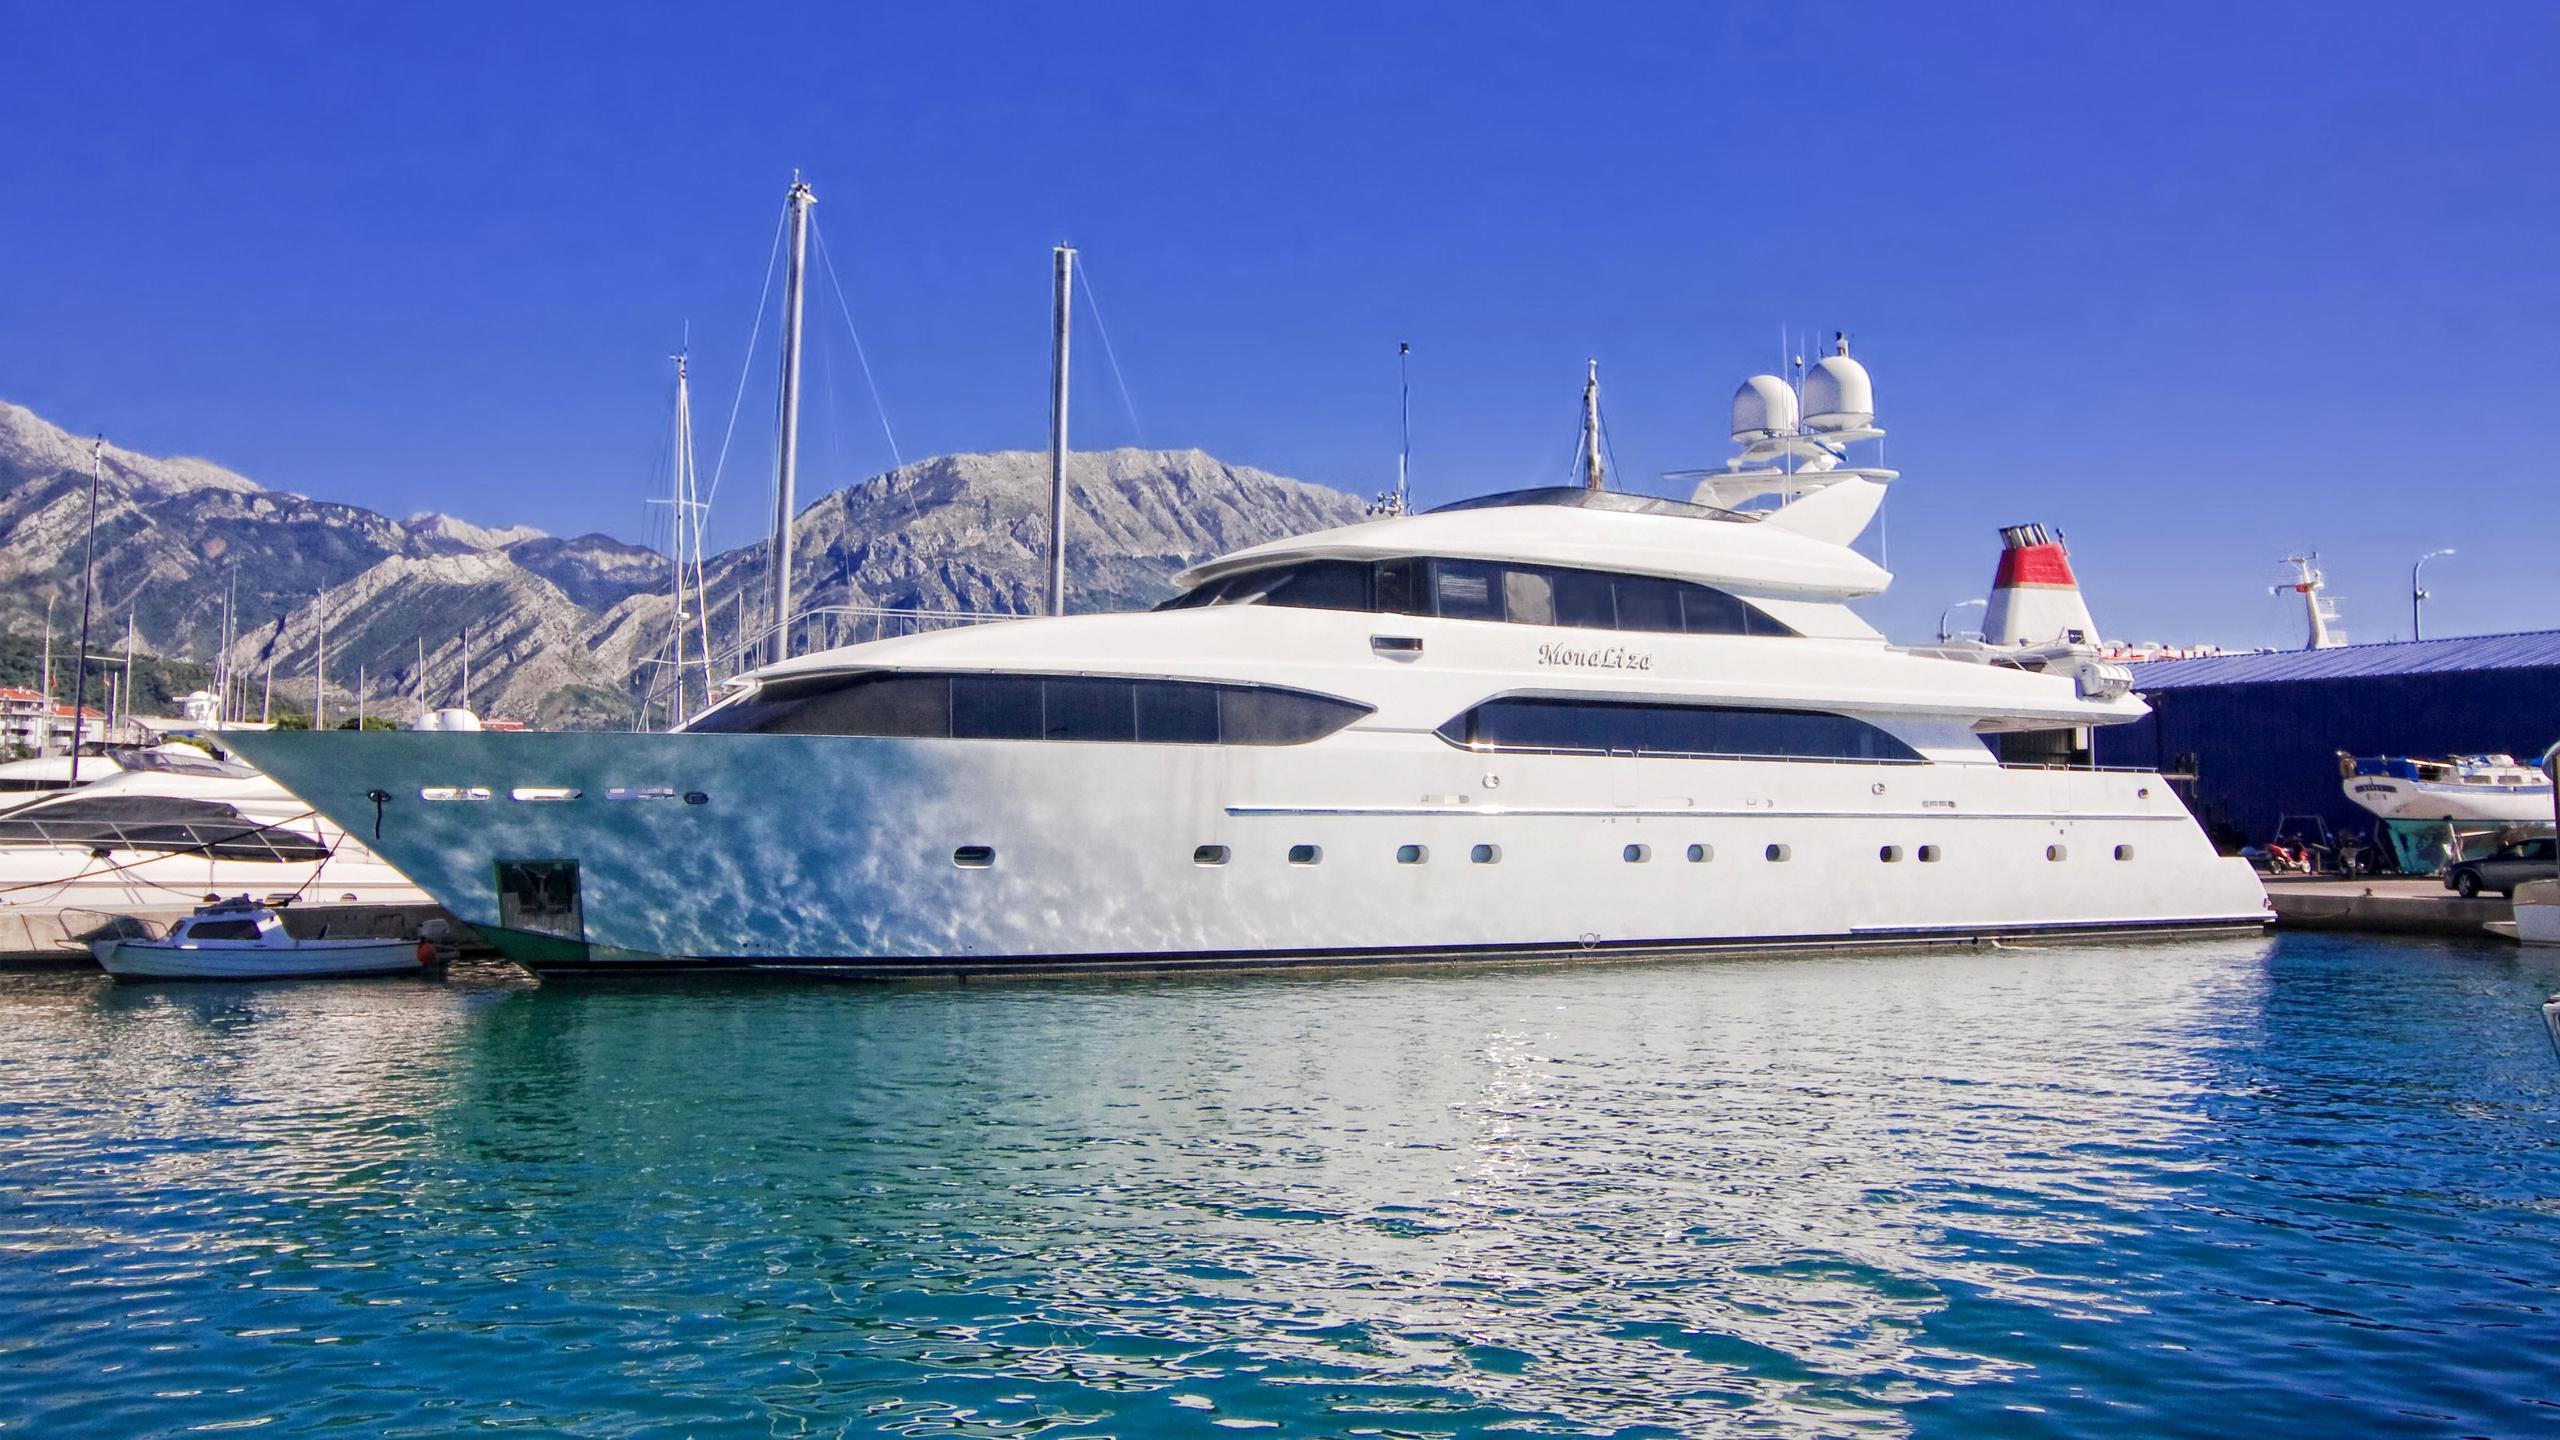 mona-liza-yacht-profile